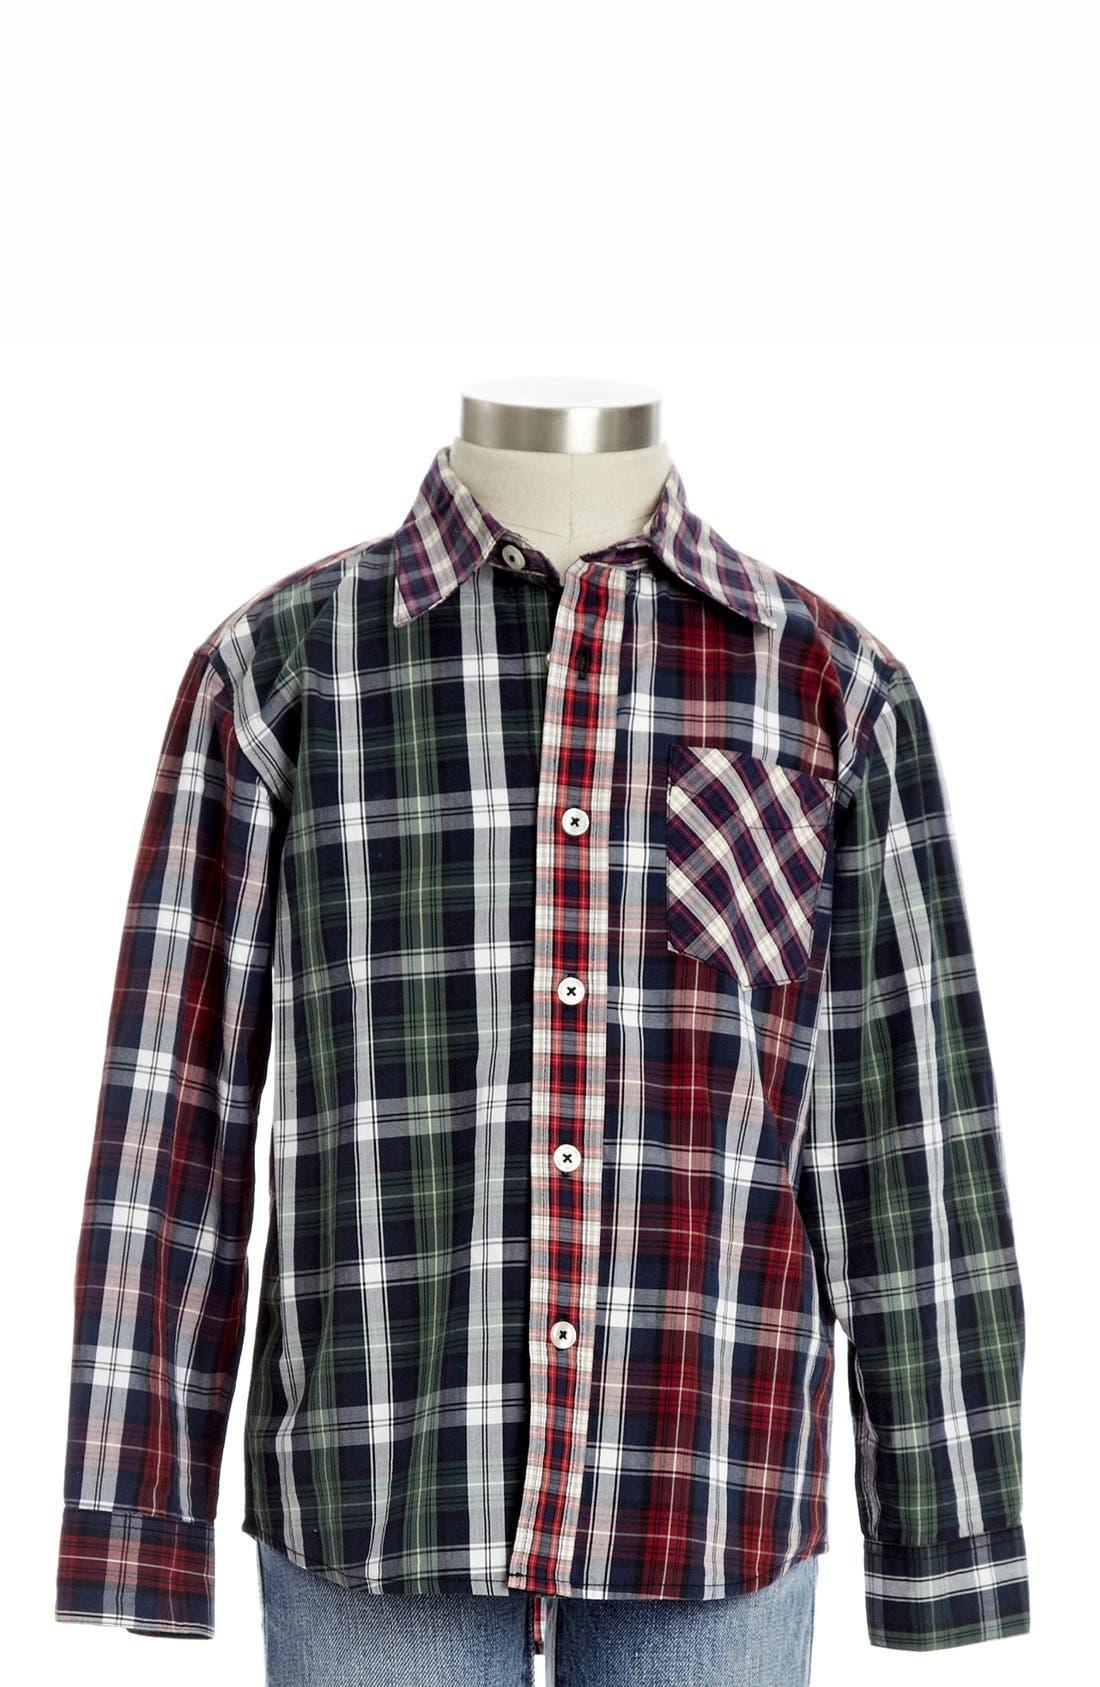 Main Image - Peek 'Piedmont' Woven Shirt (Toddler Boys, Little Boys & Big Boys)